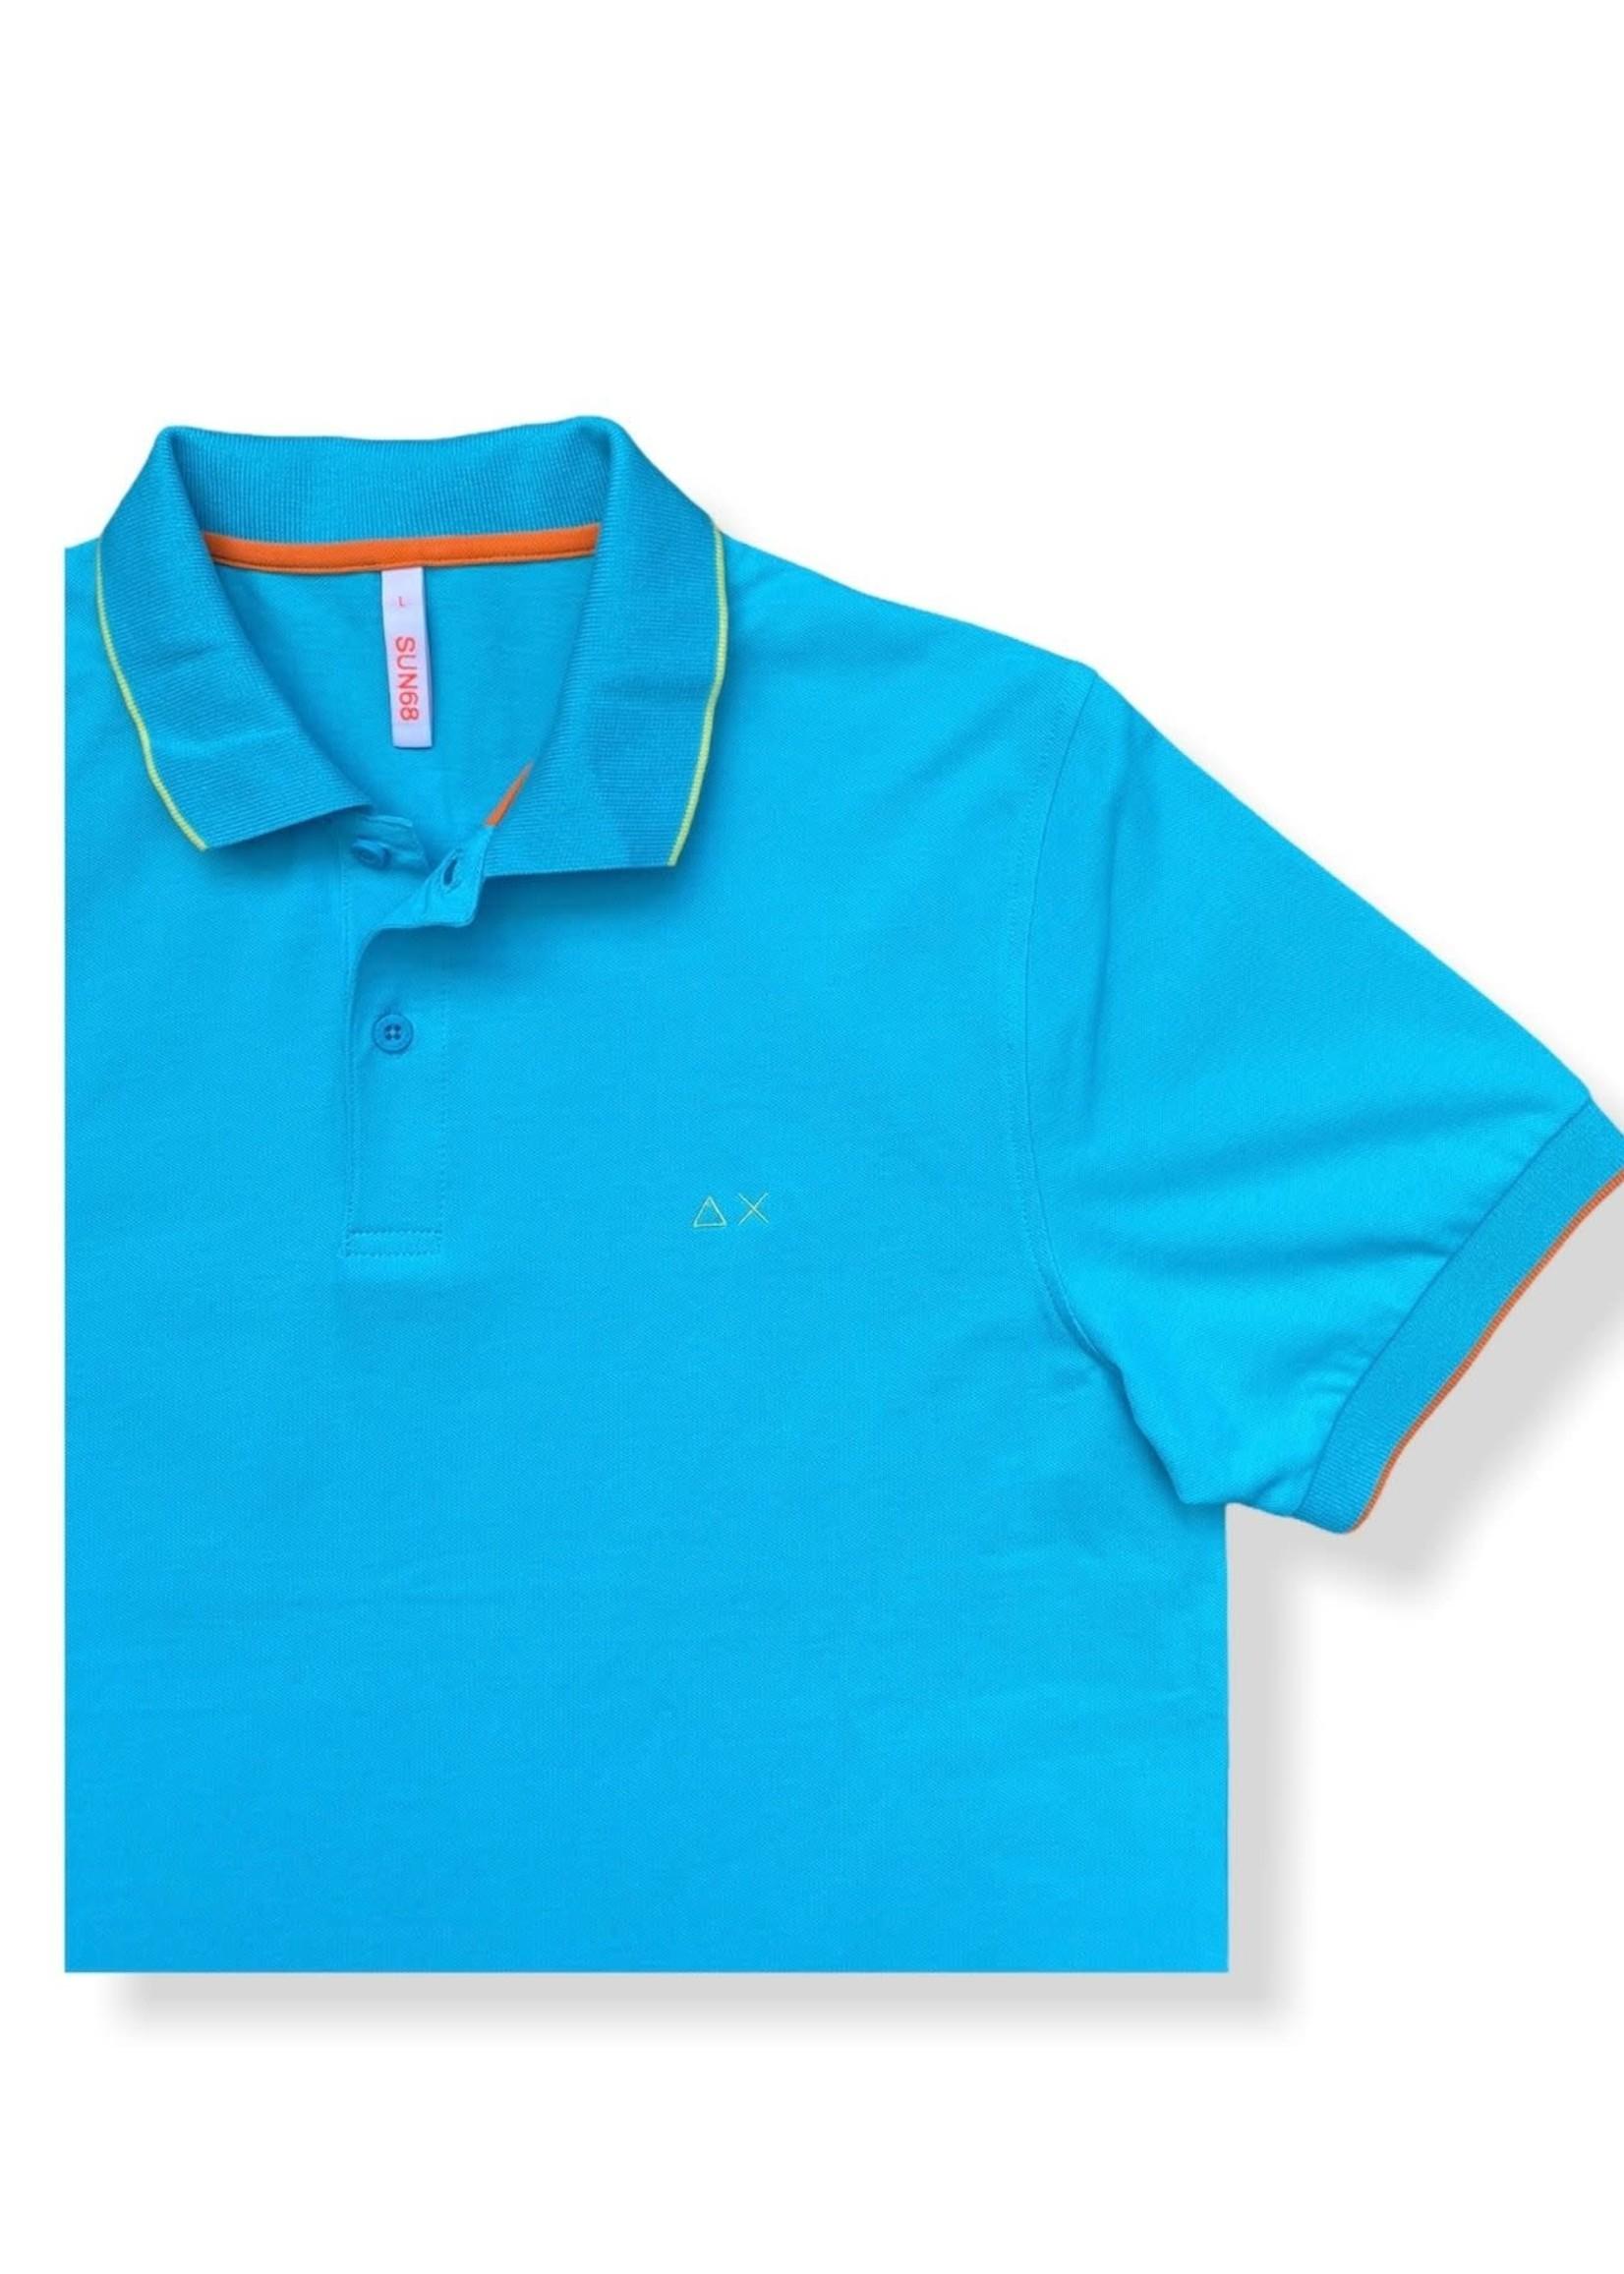 SUN68 Polo Small Stripes On Collar EL. | Turquoise | SUN68